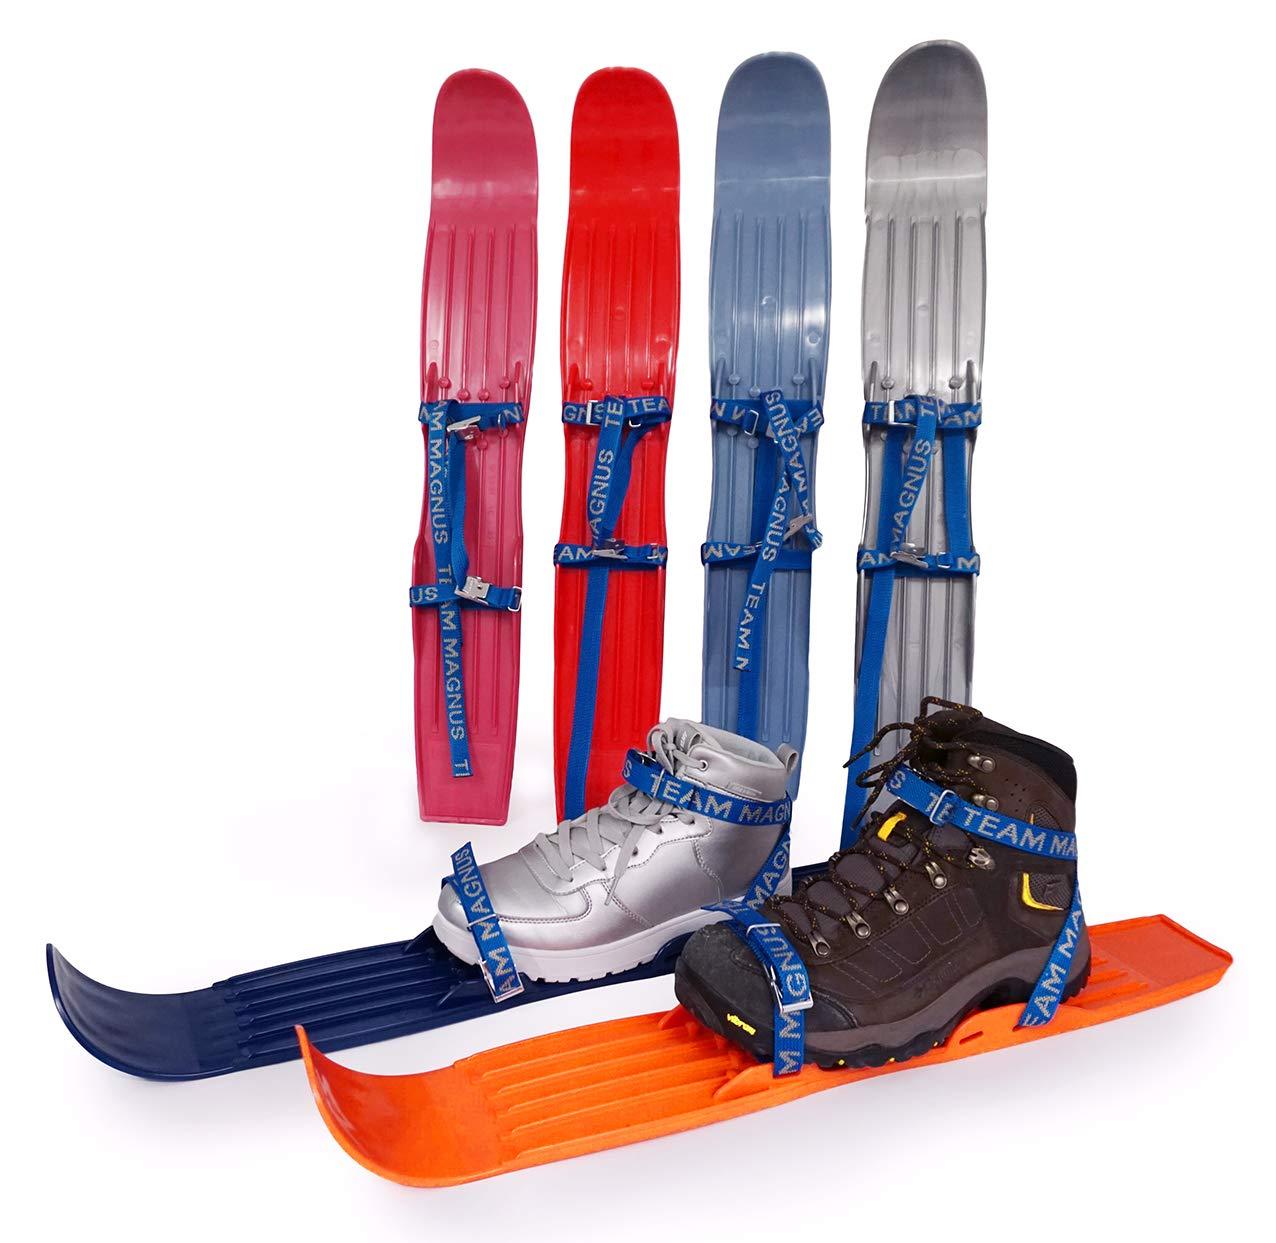 Team Magnus Kids Skis 65cm Plastic Mini Snow Skis W Quality Buckled